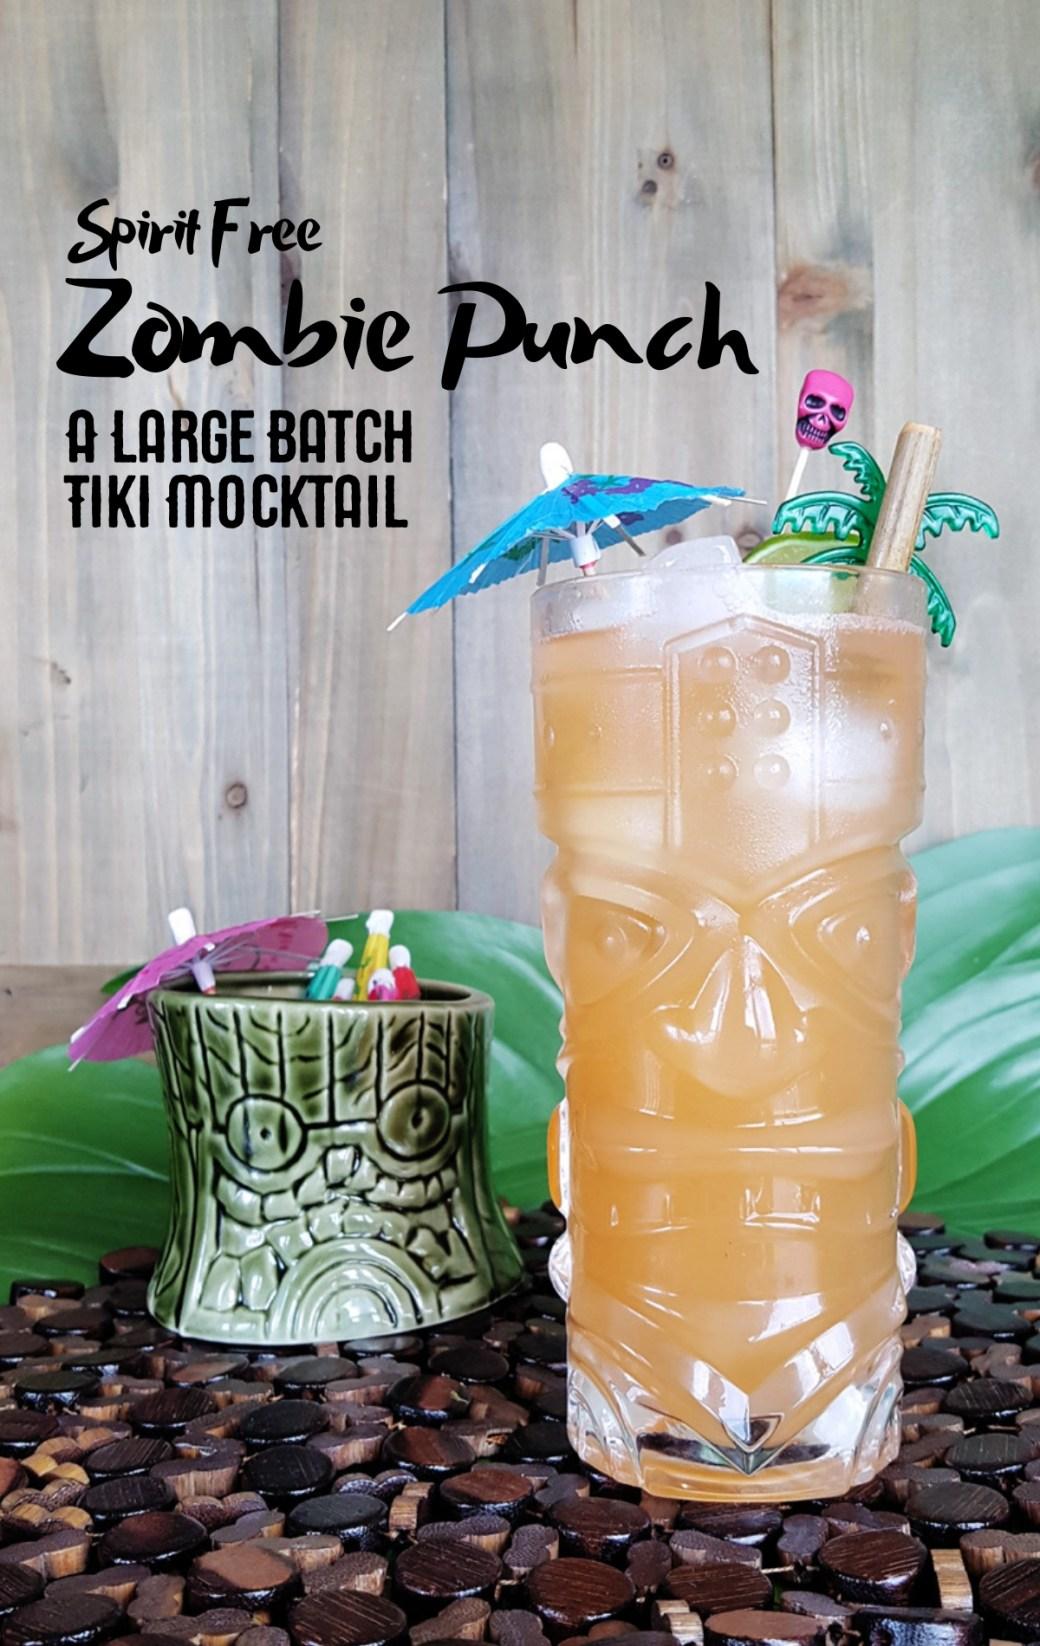 Spirit Free Zombie Punch | A Large Batch Tiki Mocktail